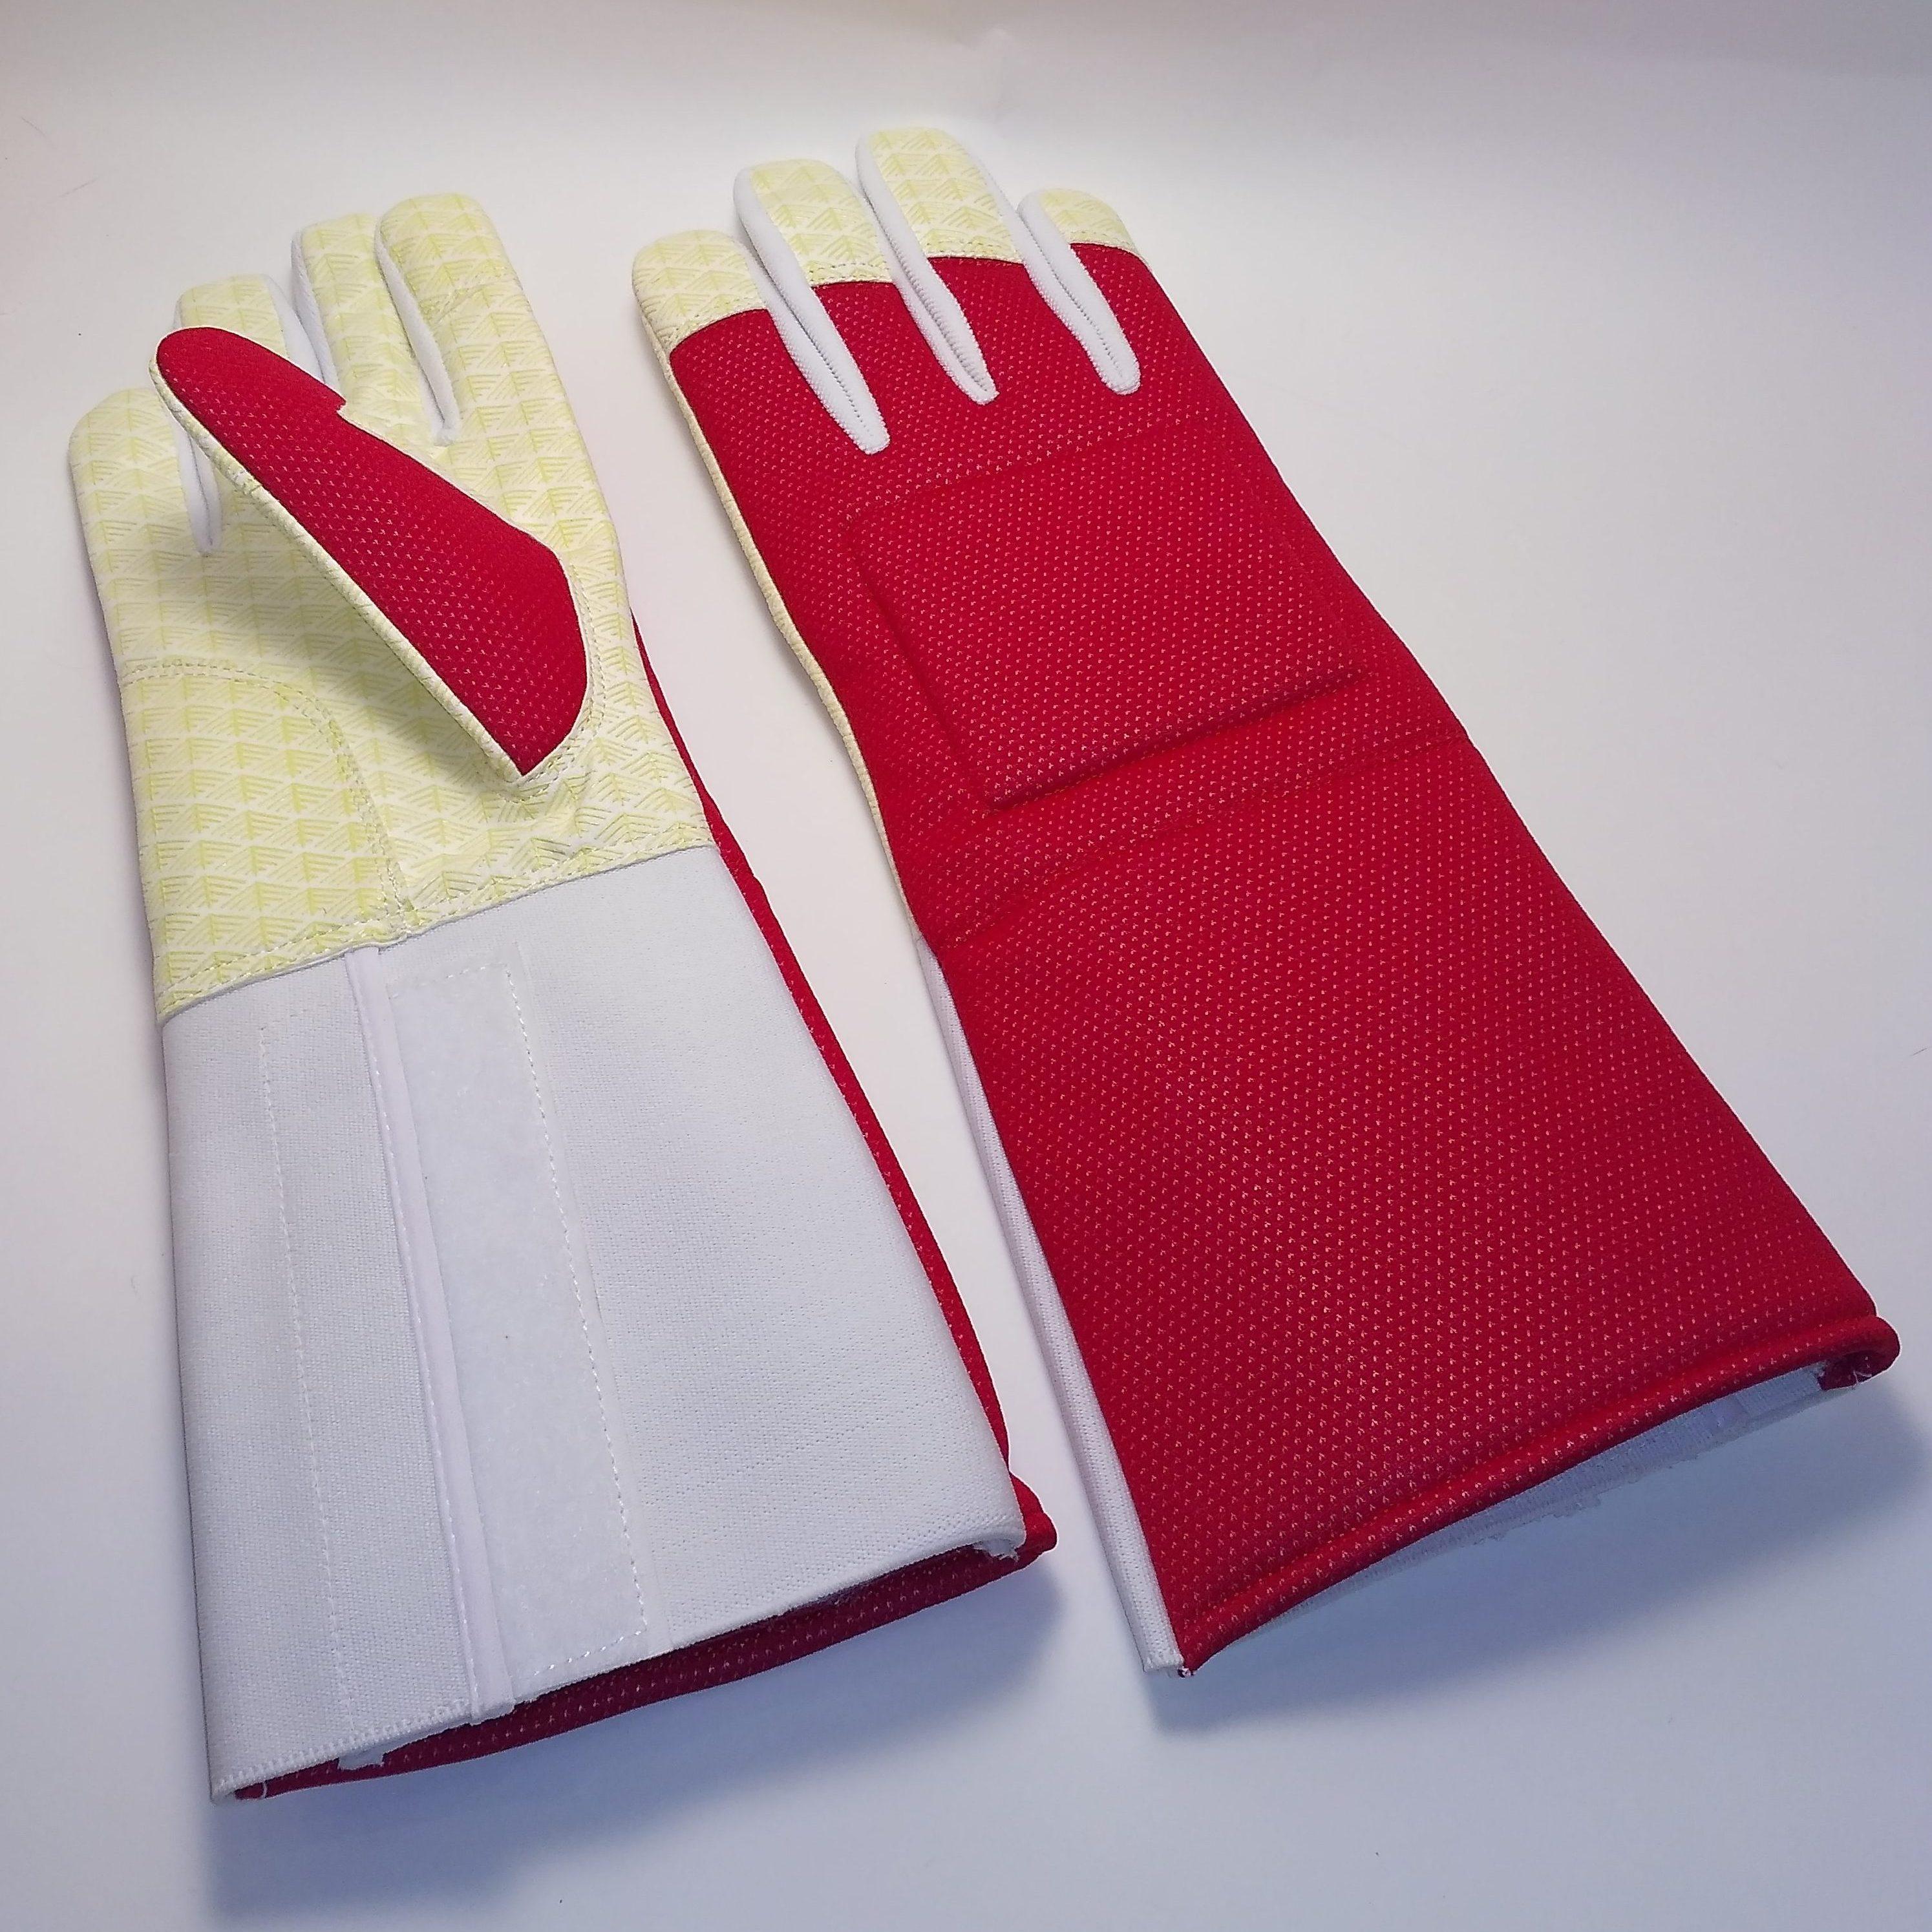 Перчатка с нескользящим покрытием RED Шпага_рапира_AME-01